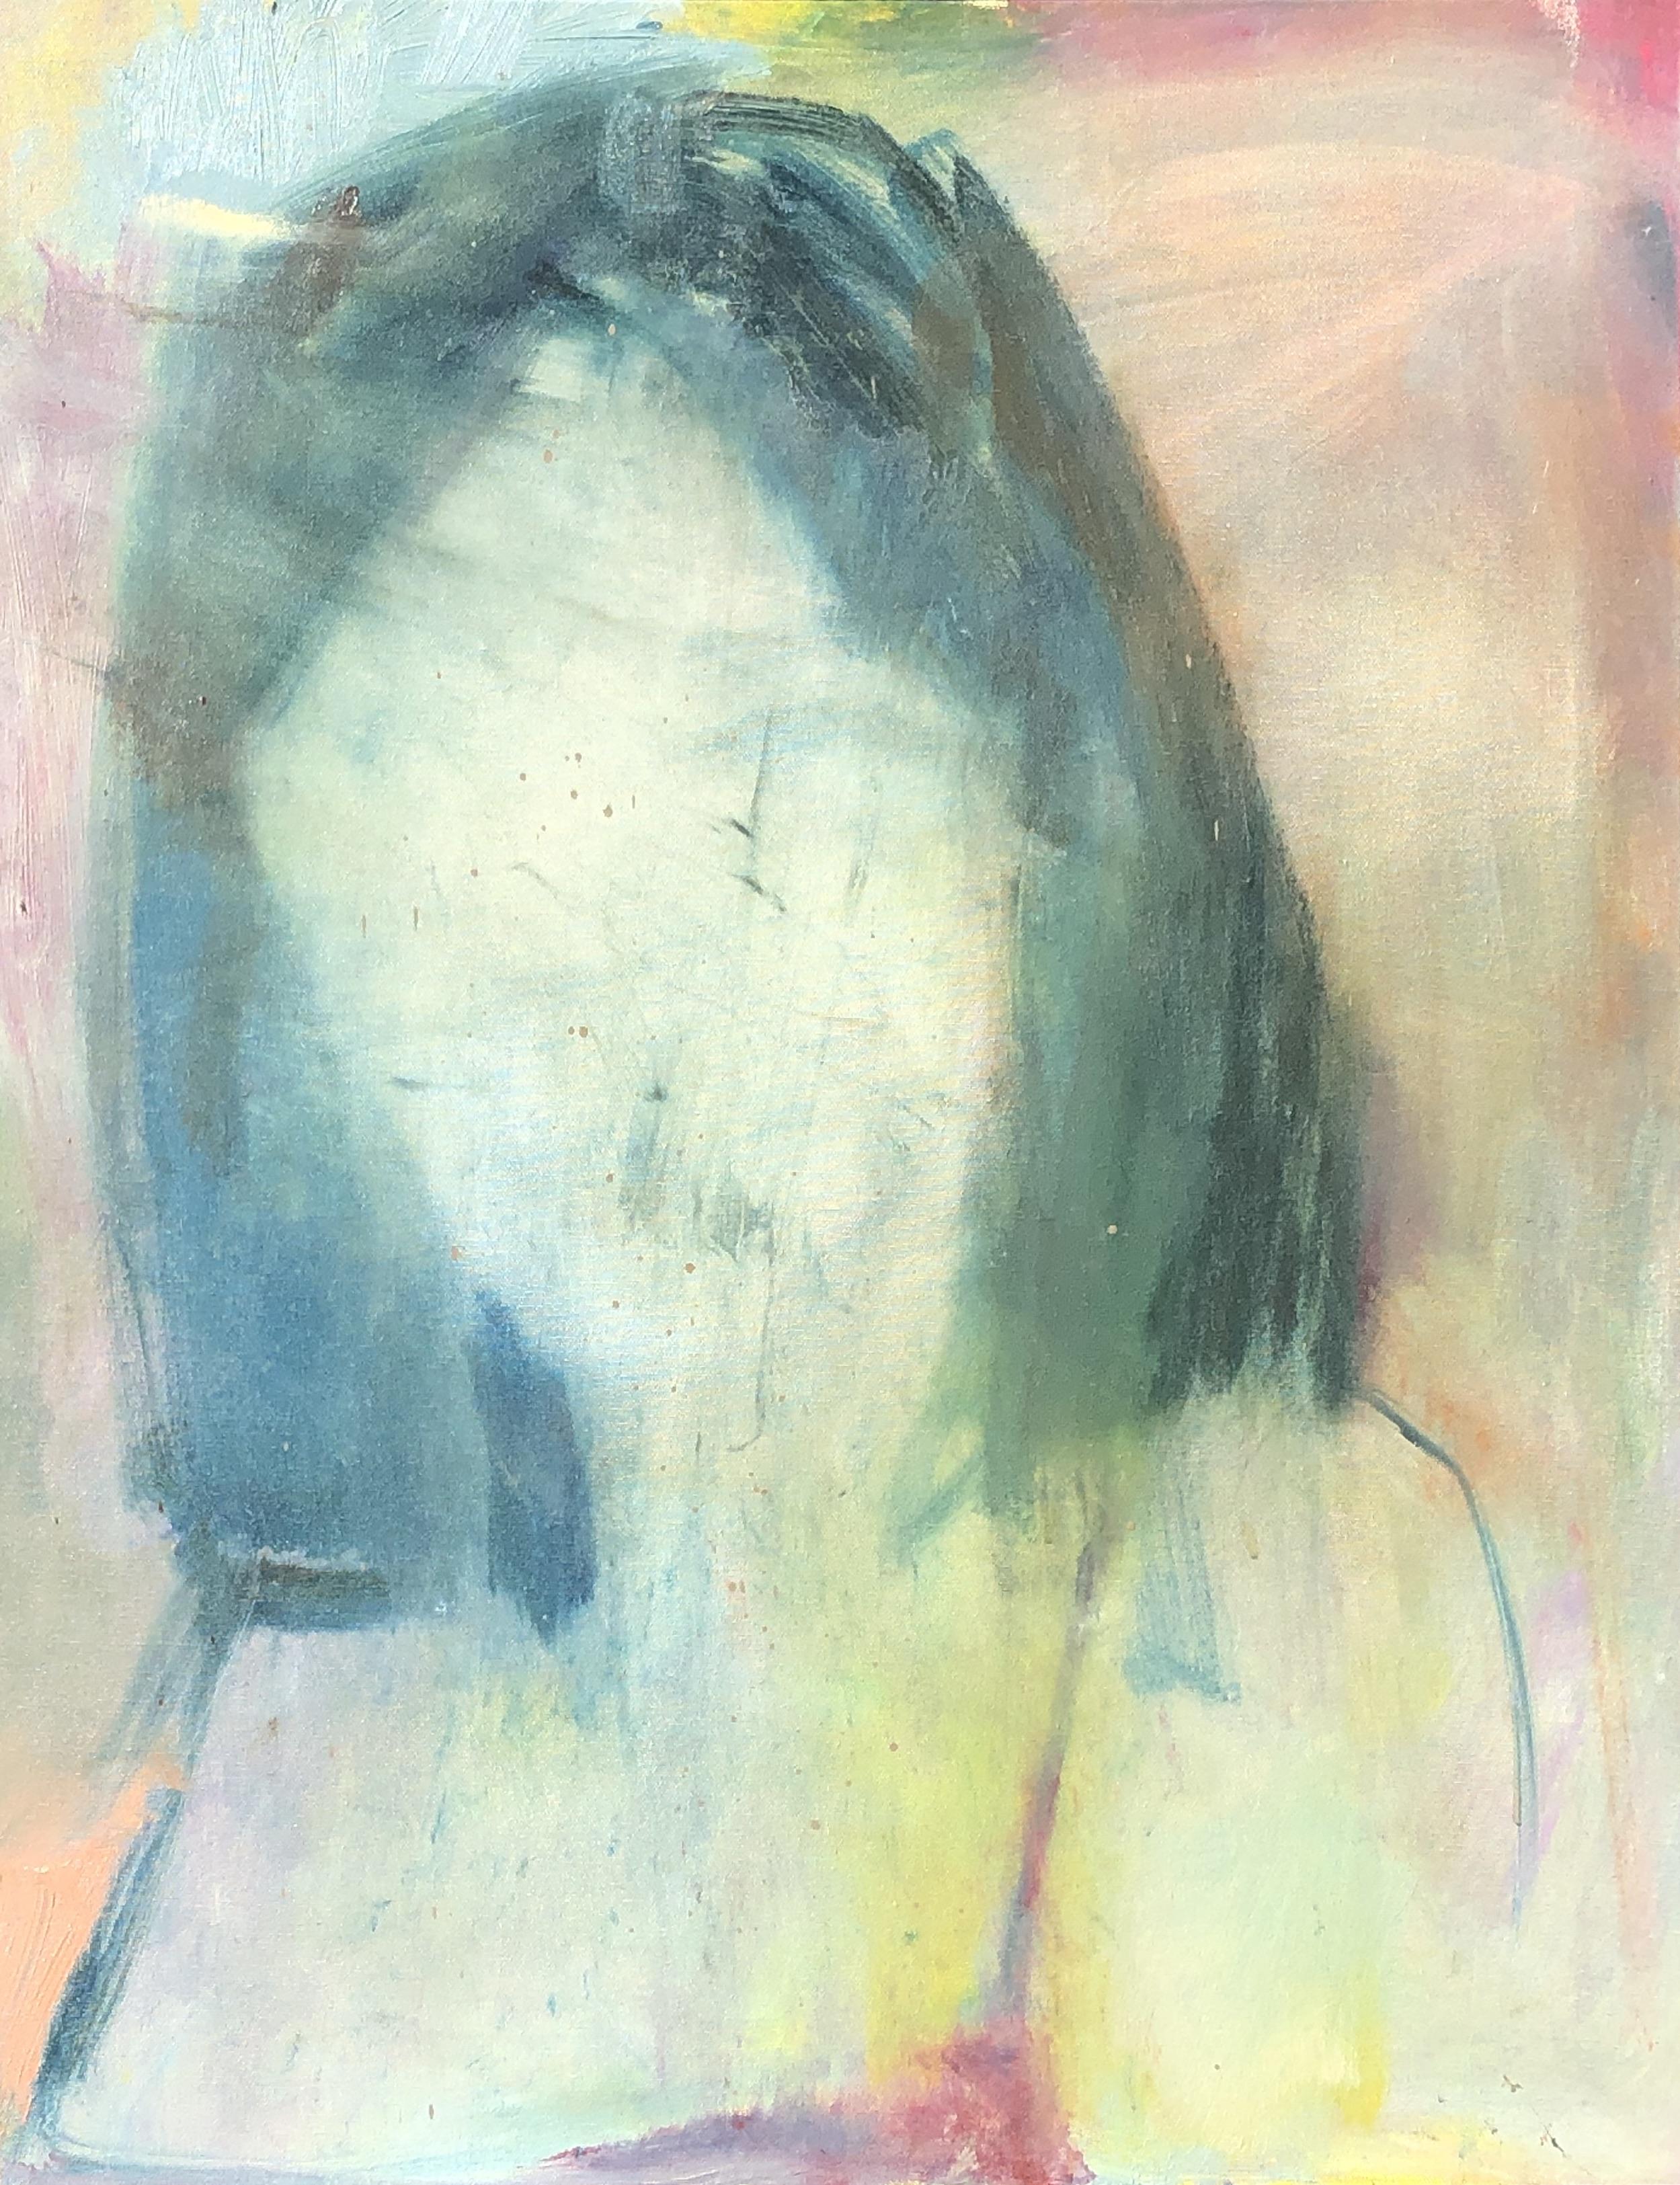 Asami Erased Portrait (30x24)